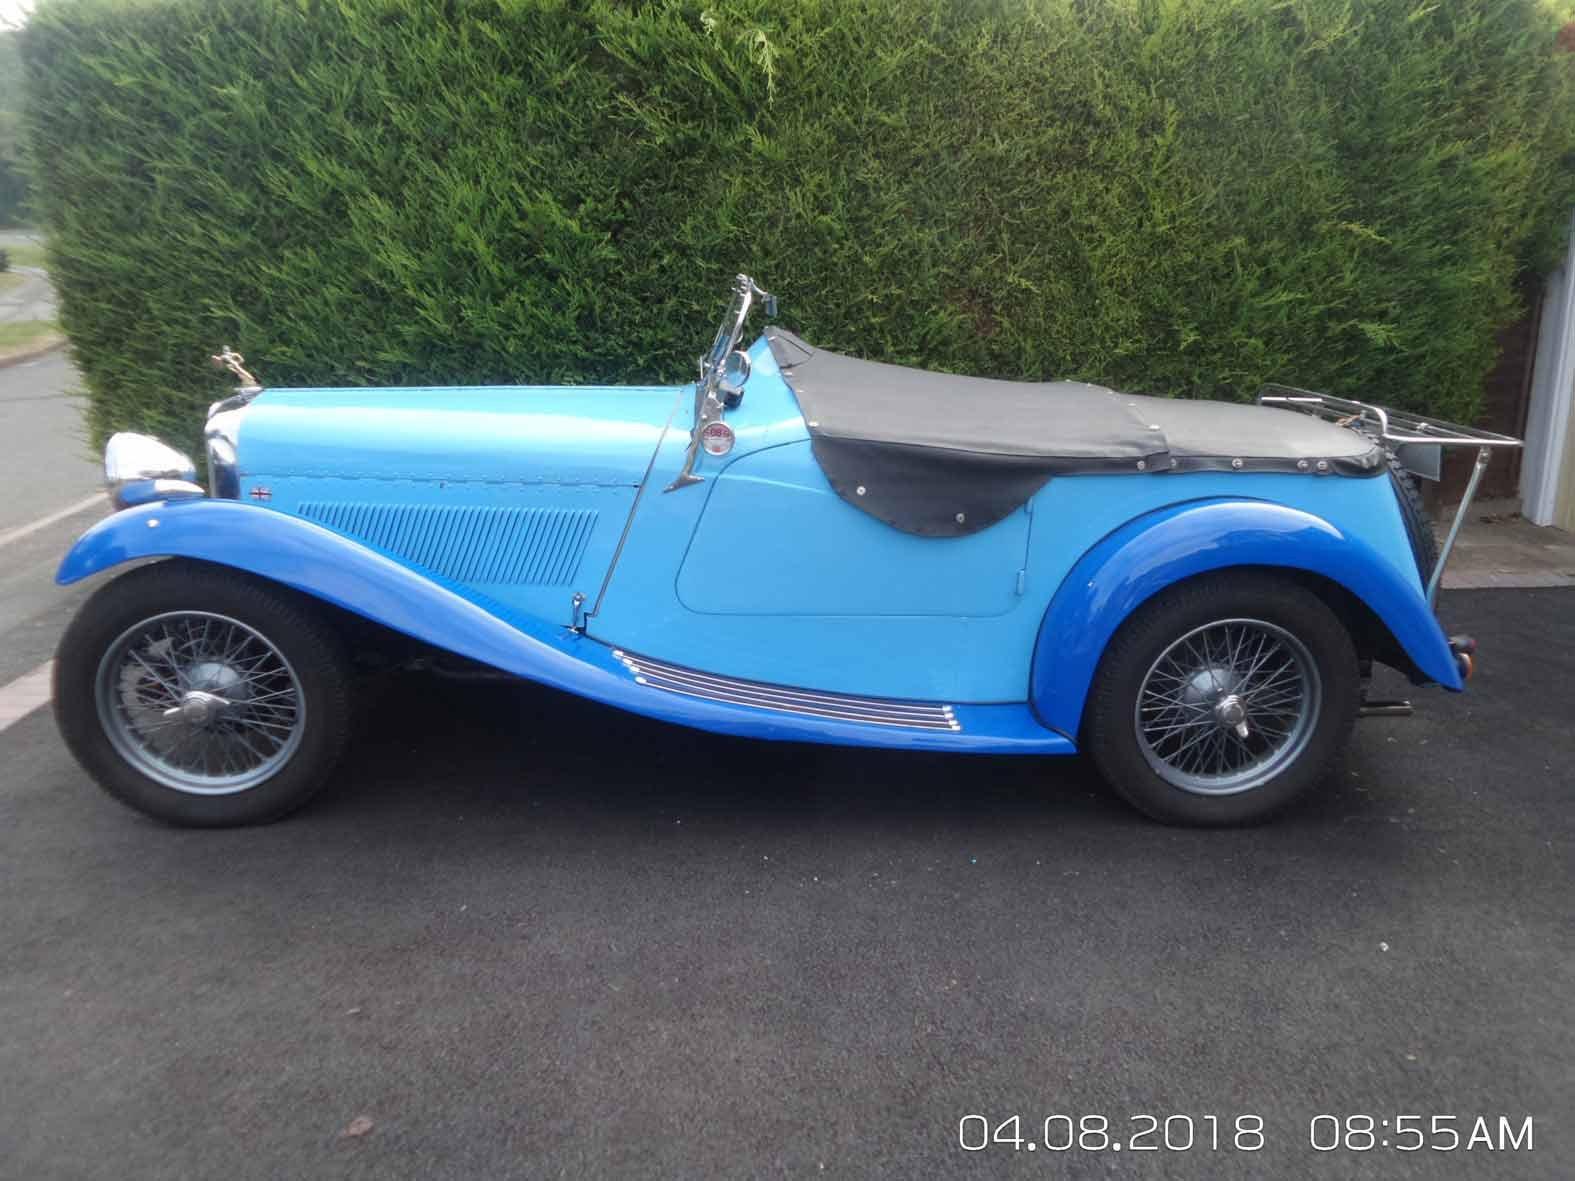 1934 SALMSON - British Salmson S4C  sports coupé. For Sale (picture 2 of 6)